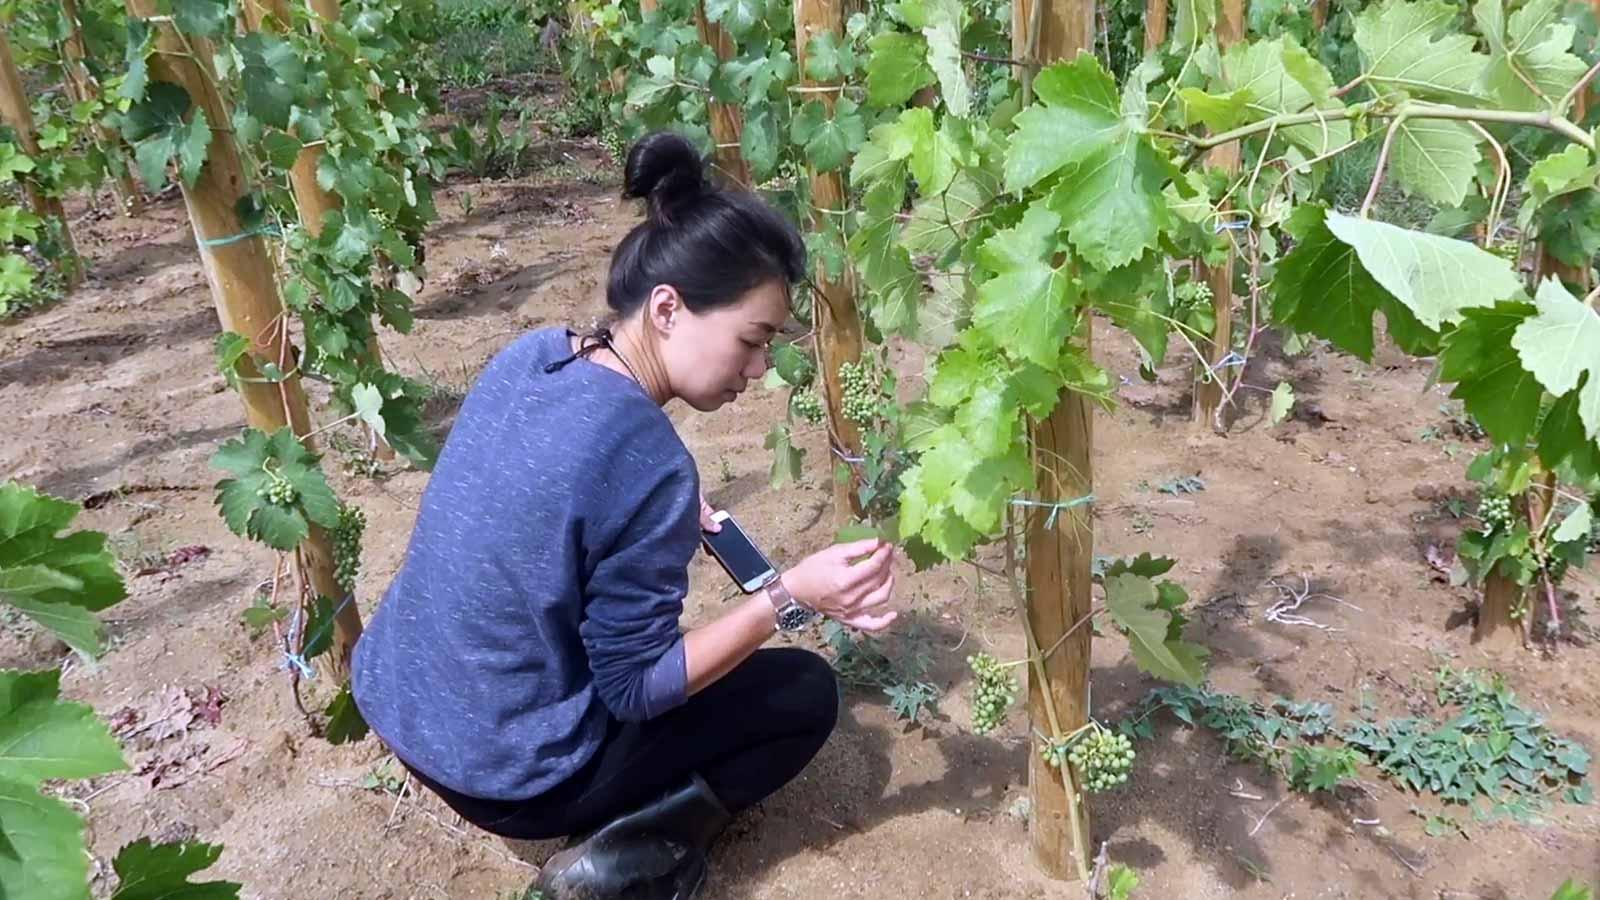 wone inspecting vine